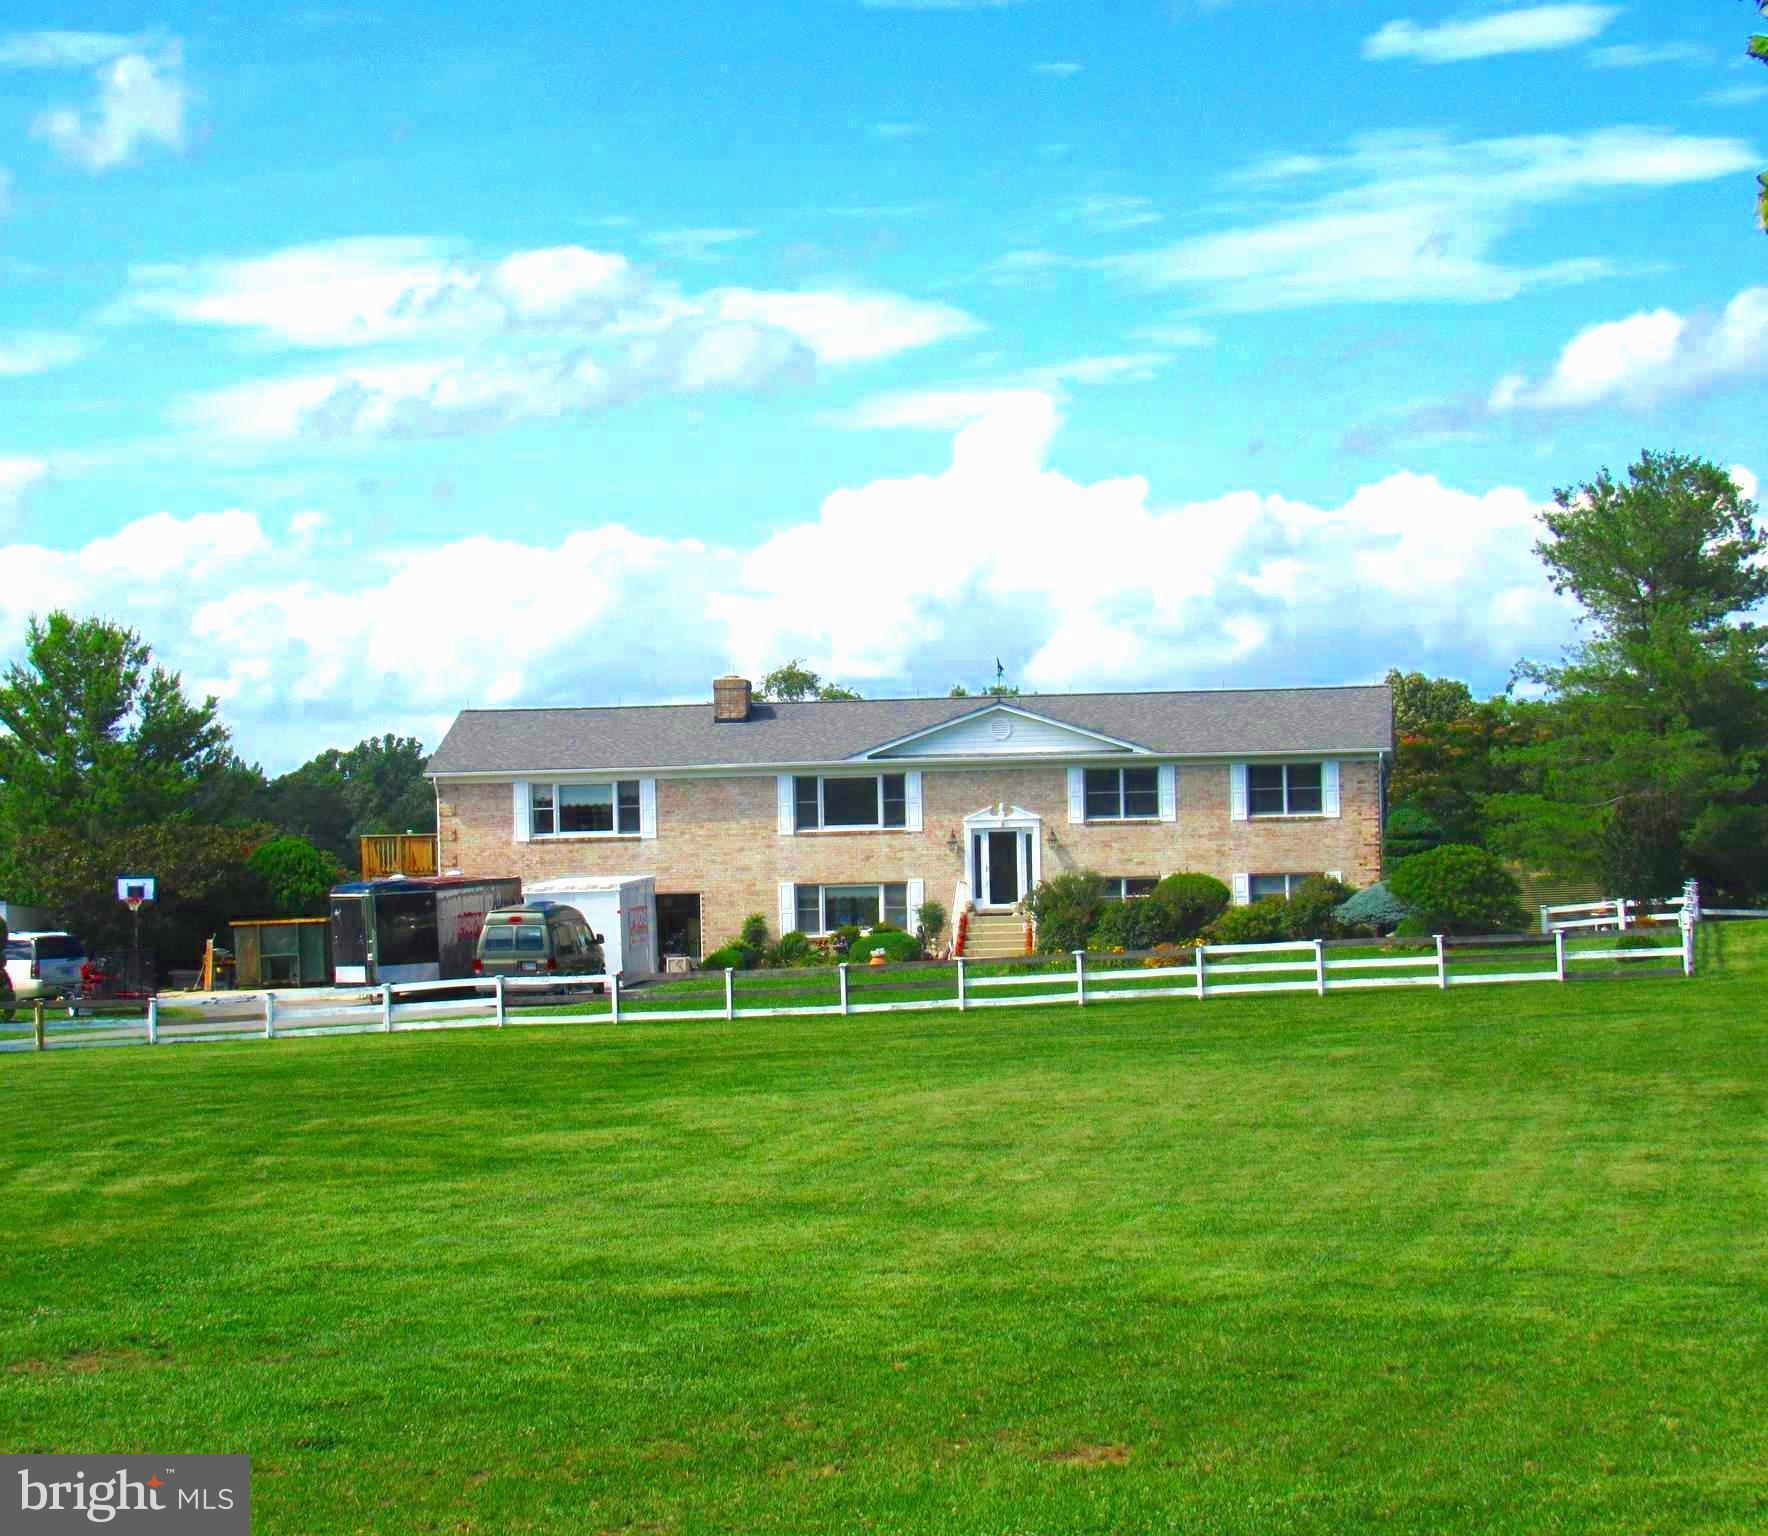 7000 Leonardtown Rd, Bryantown, MD, 20617